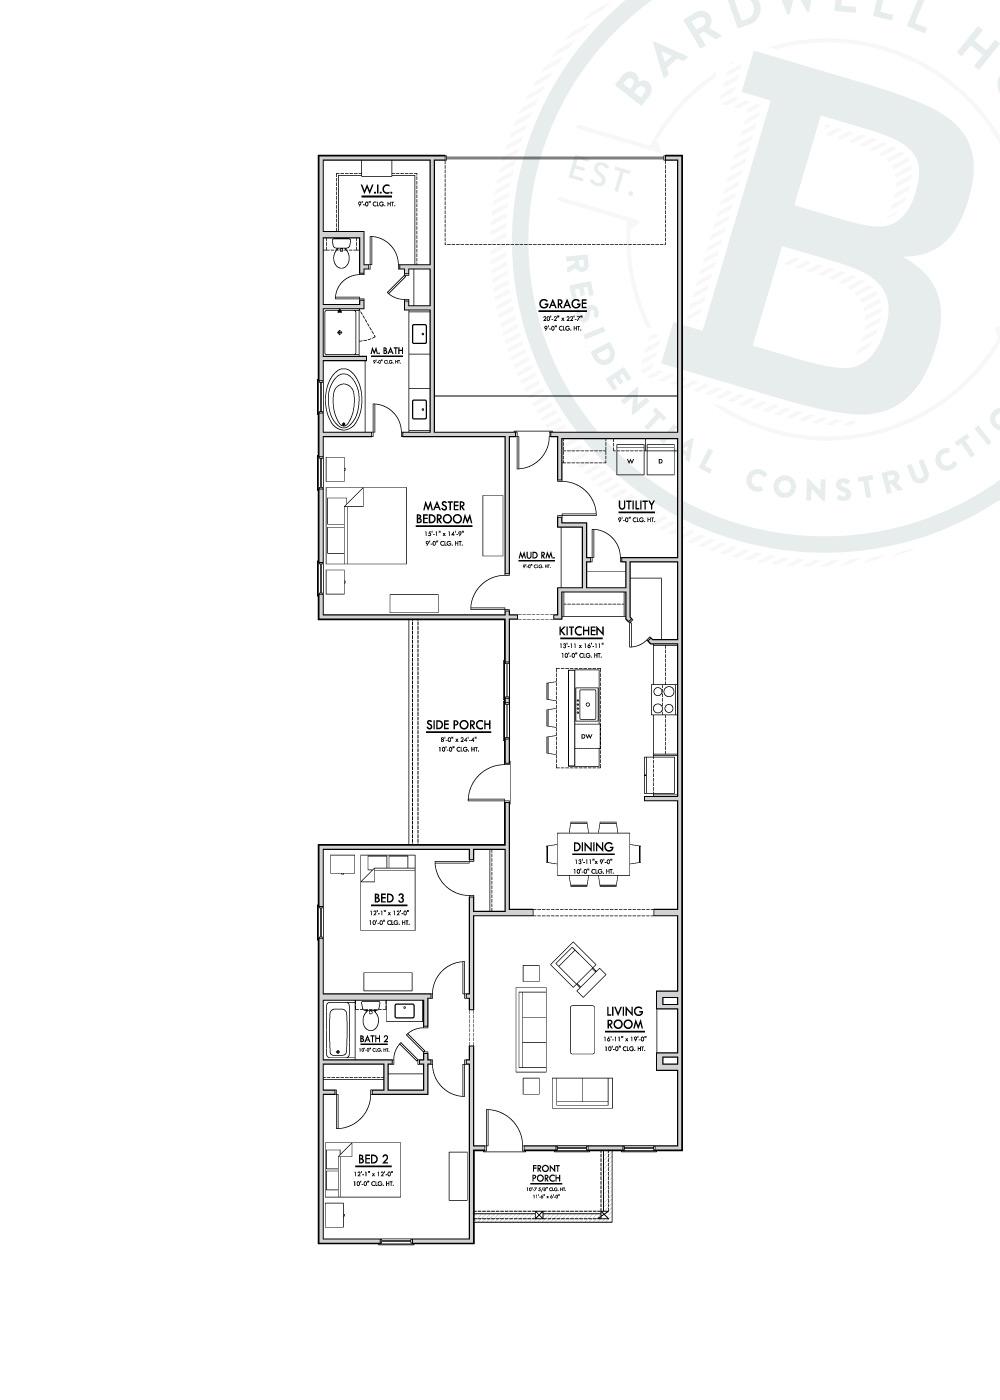 Toulouse-A_Floorplan_4.26.19